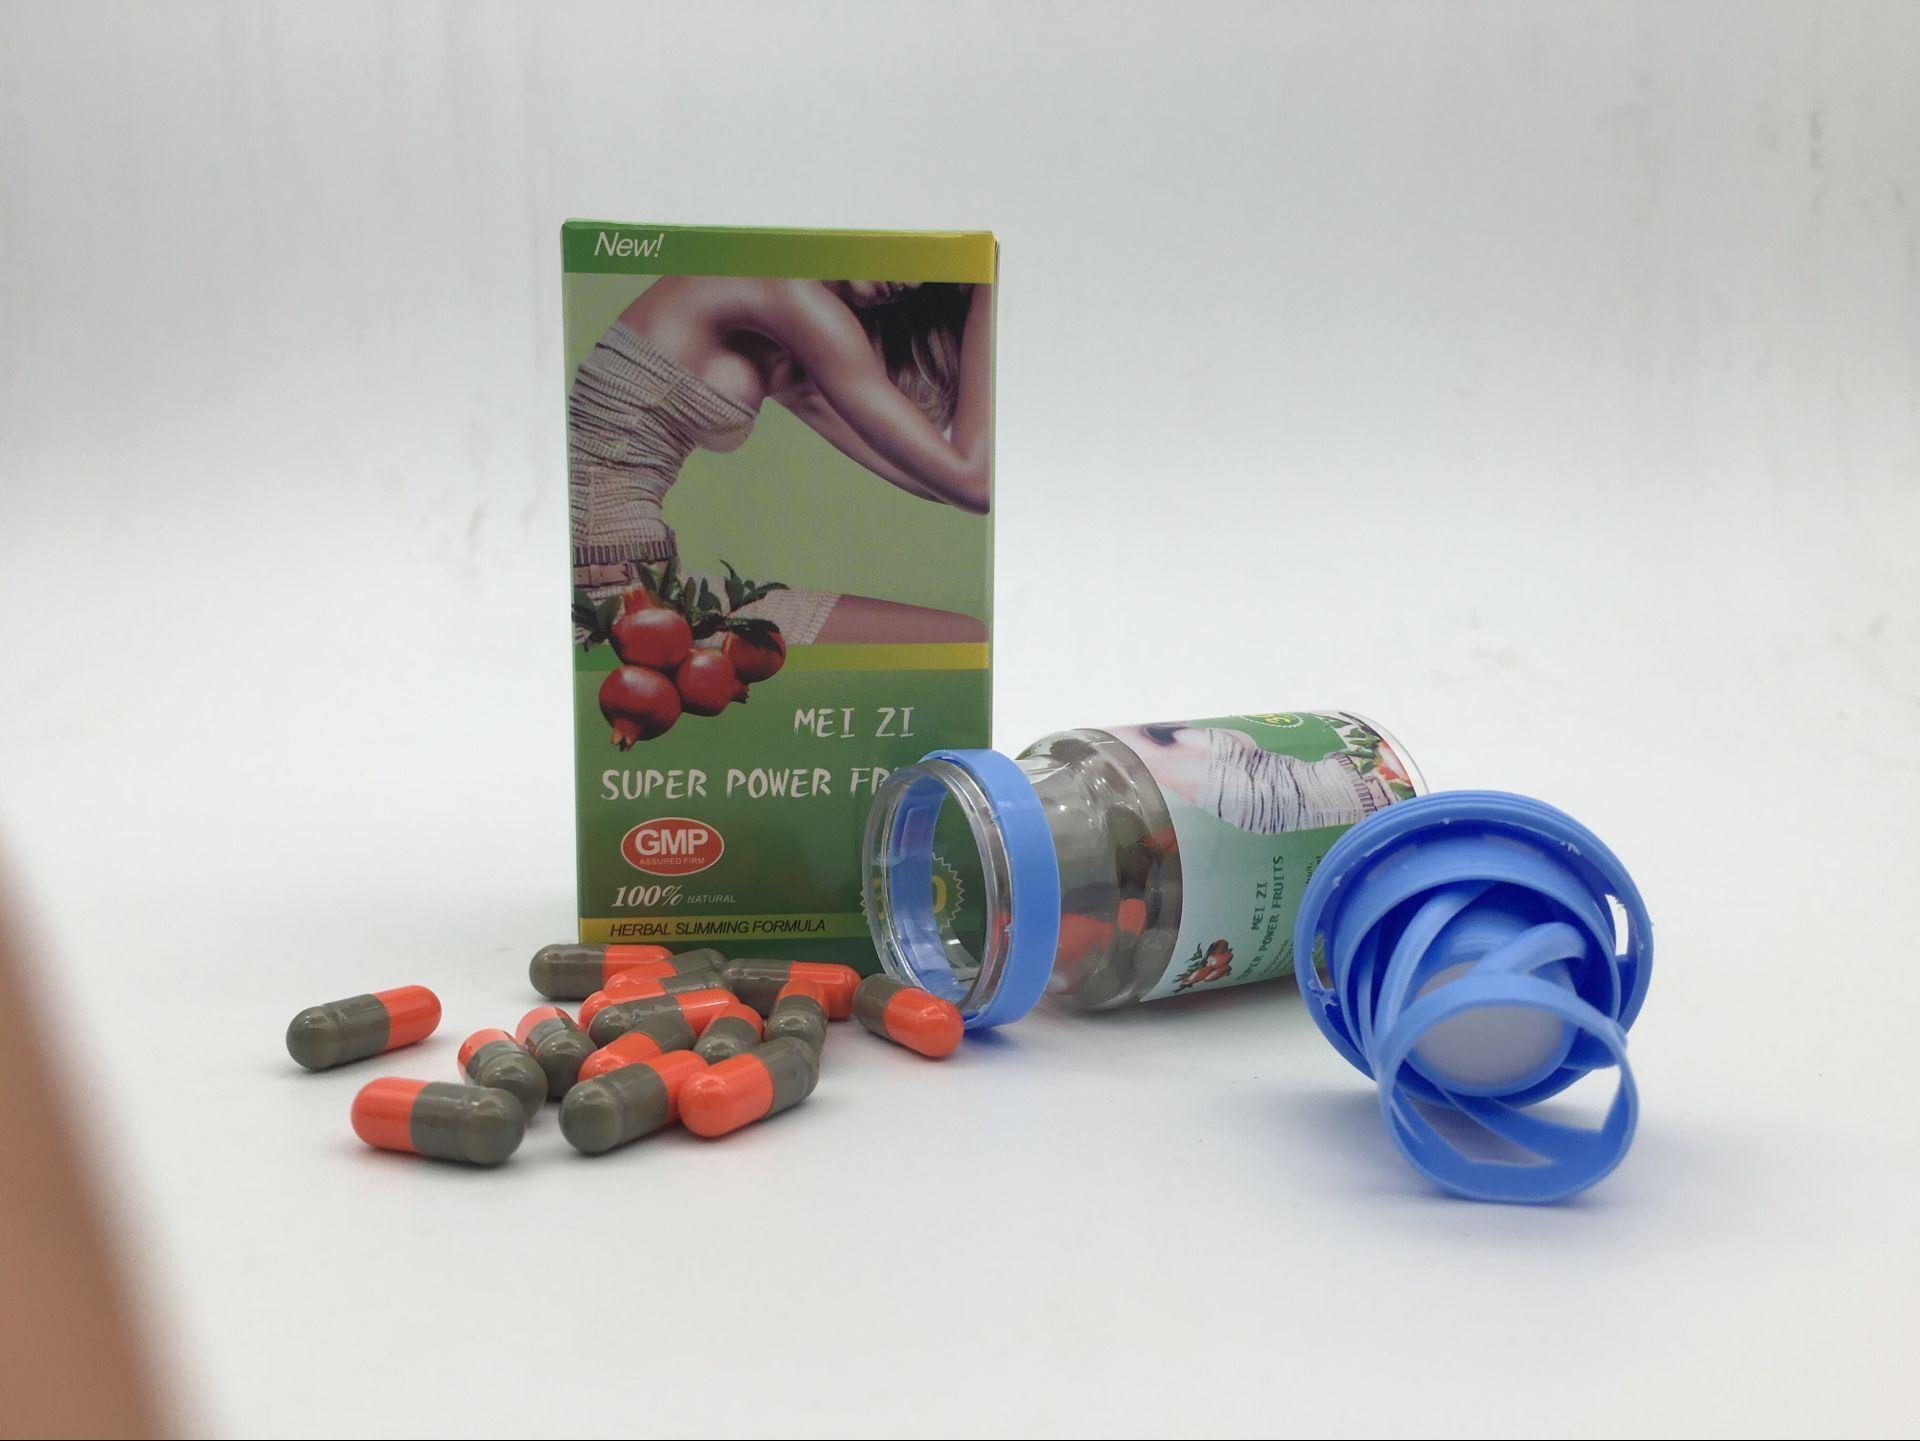 OEM Private label Meizi Super Power Fruit Slimming Pills